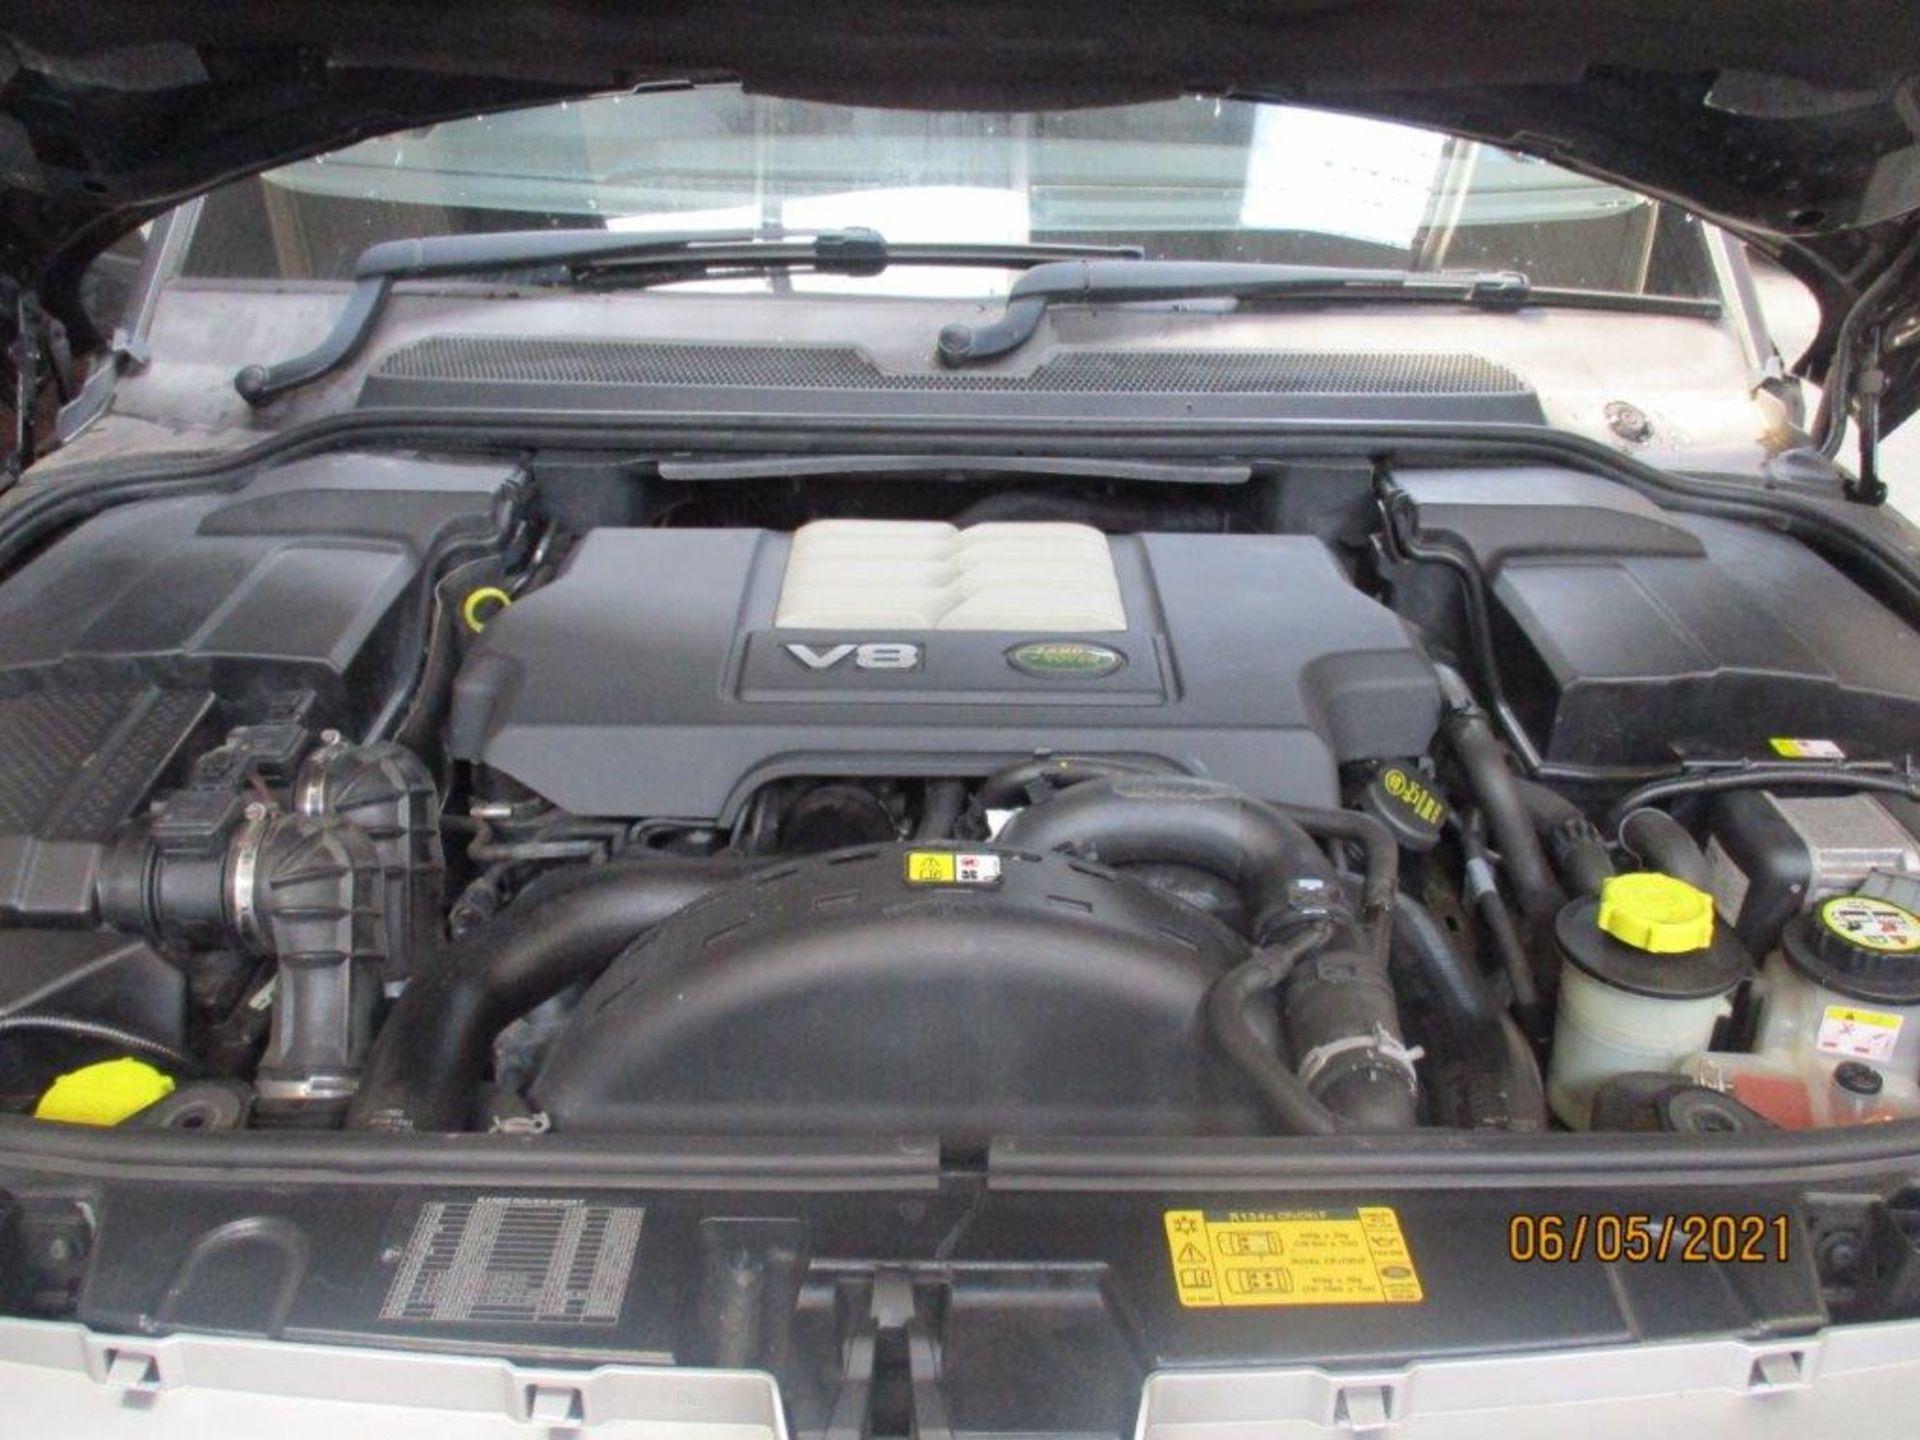 08 08 R/R Sport HSE TDV8 Auto - Image 8 of 19